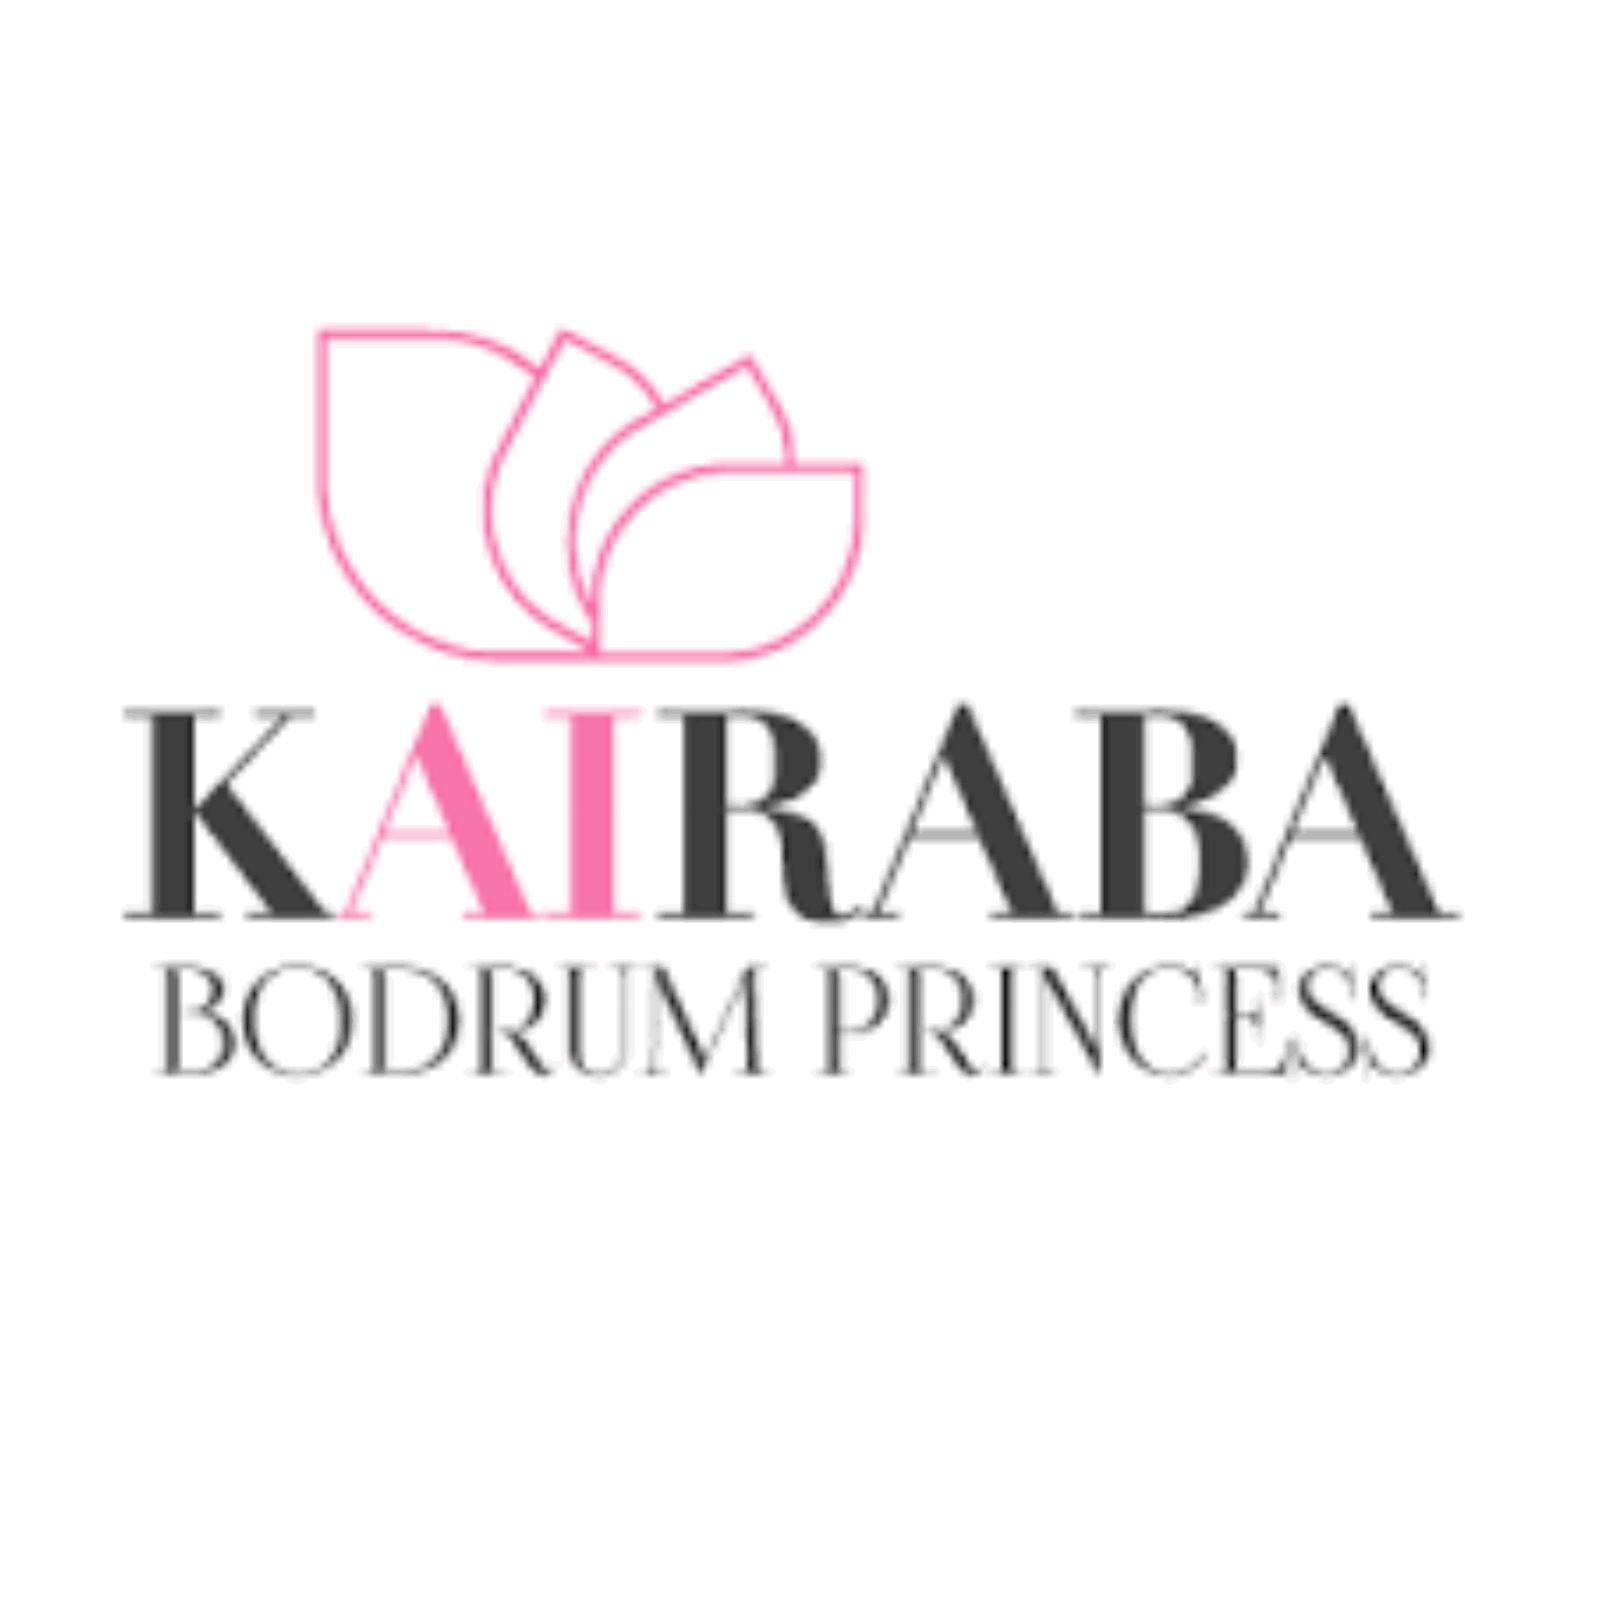 BLUE DREAMS KAIRABA RESORT & SPA